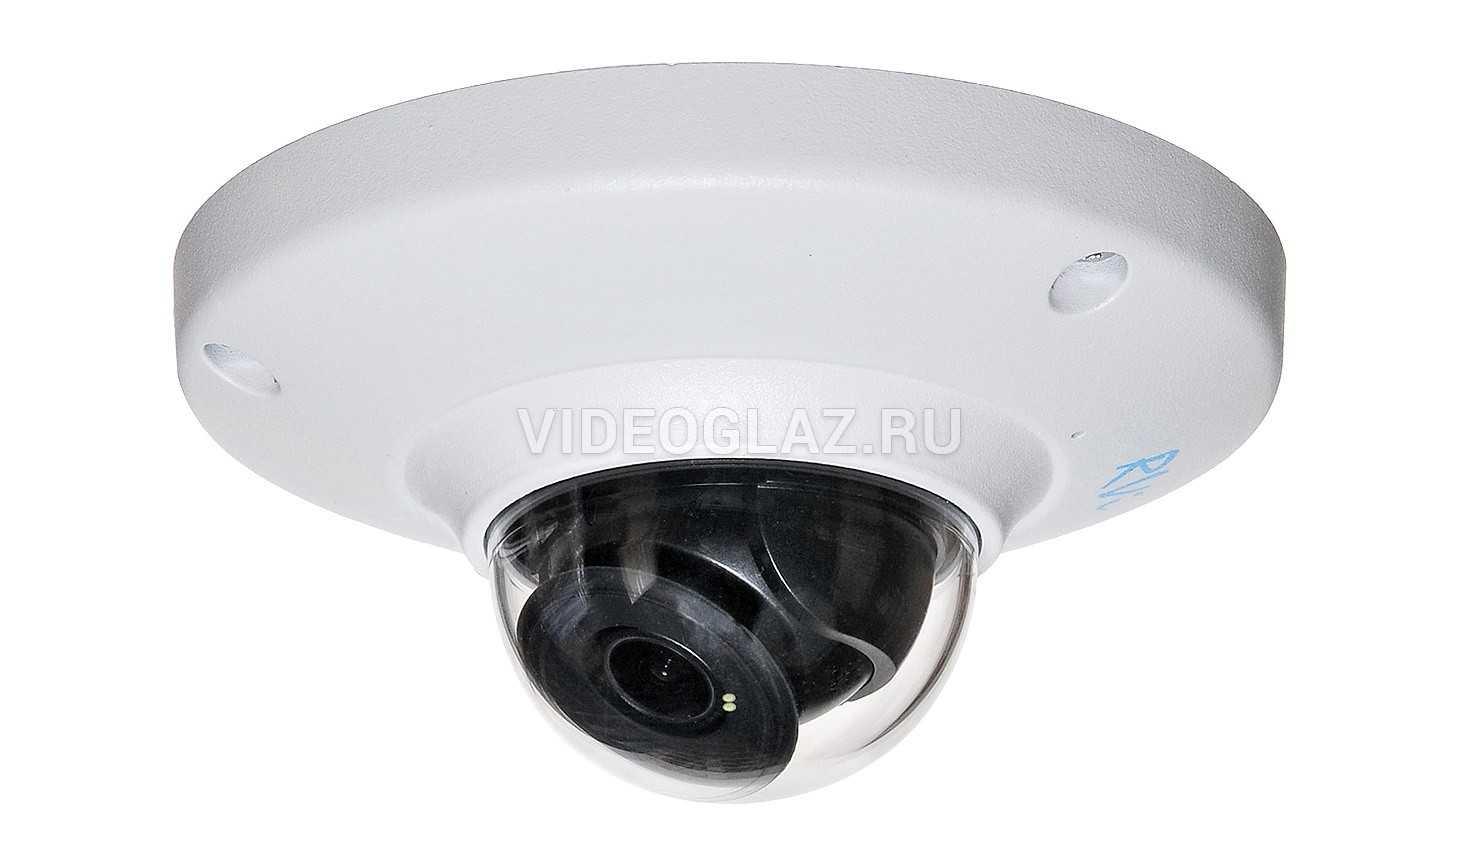 Видеокамера RVi-IPC75